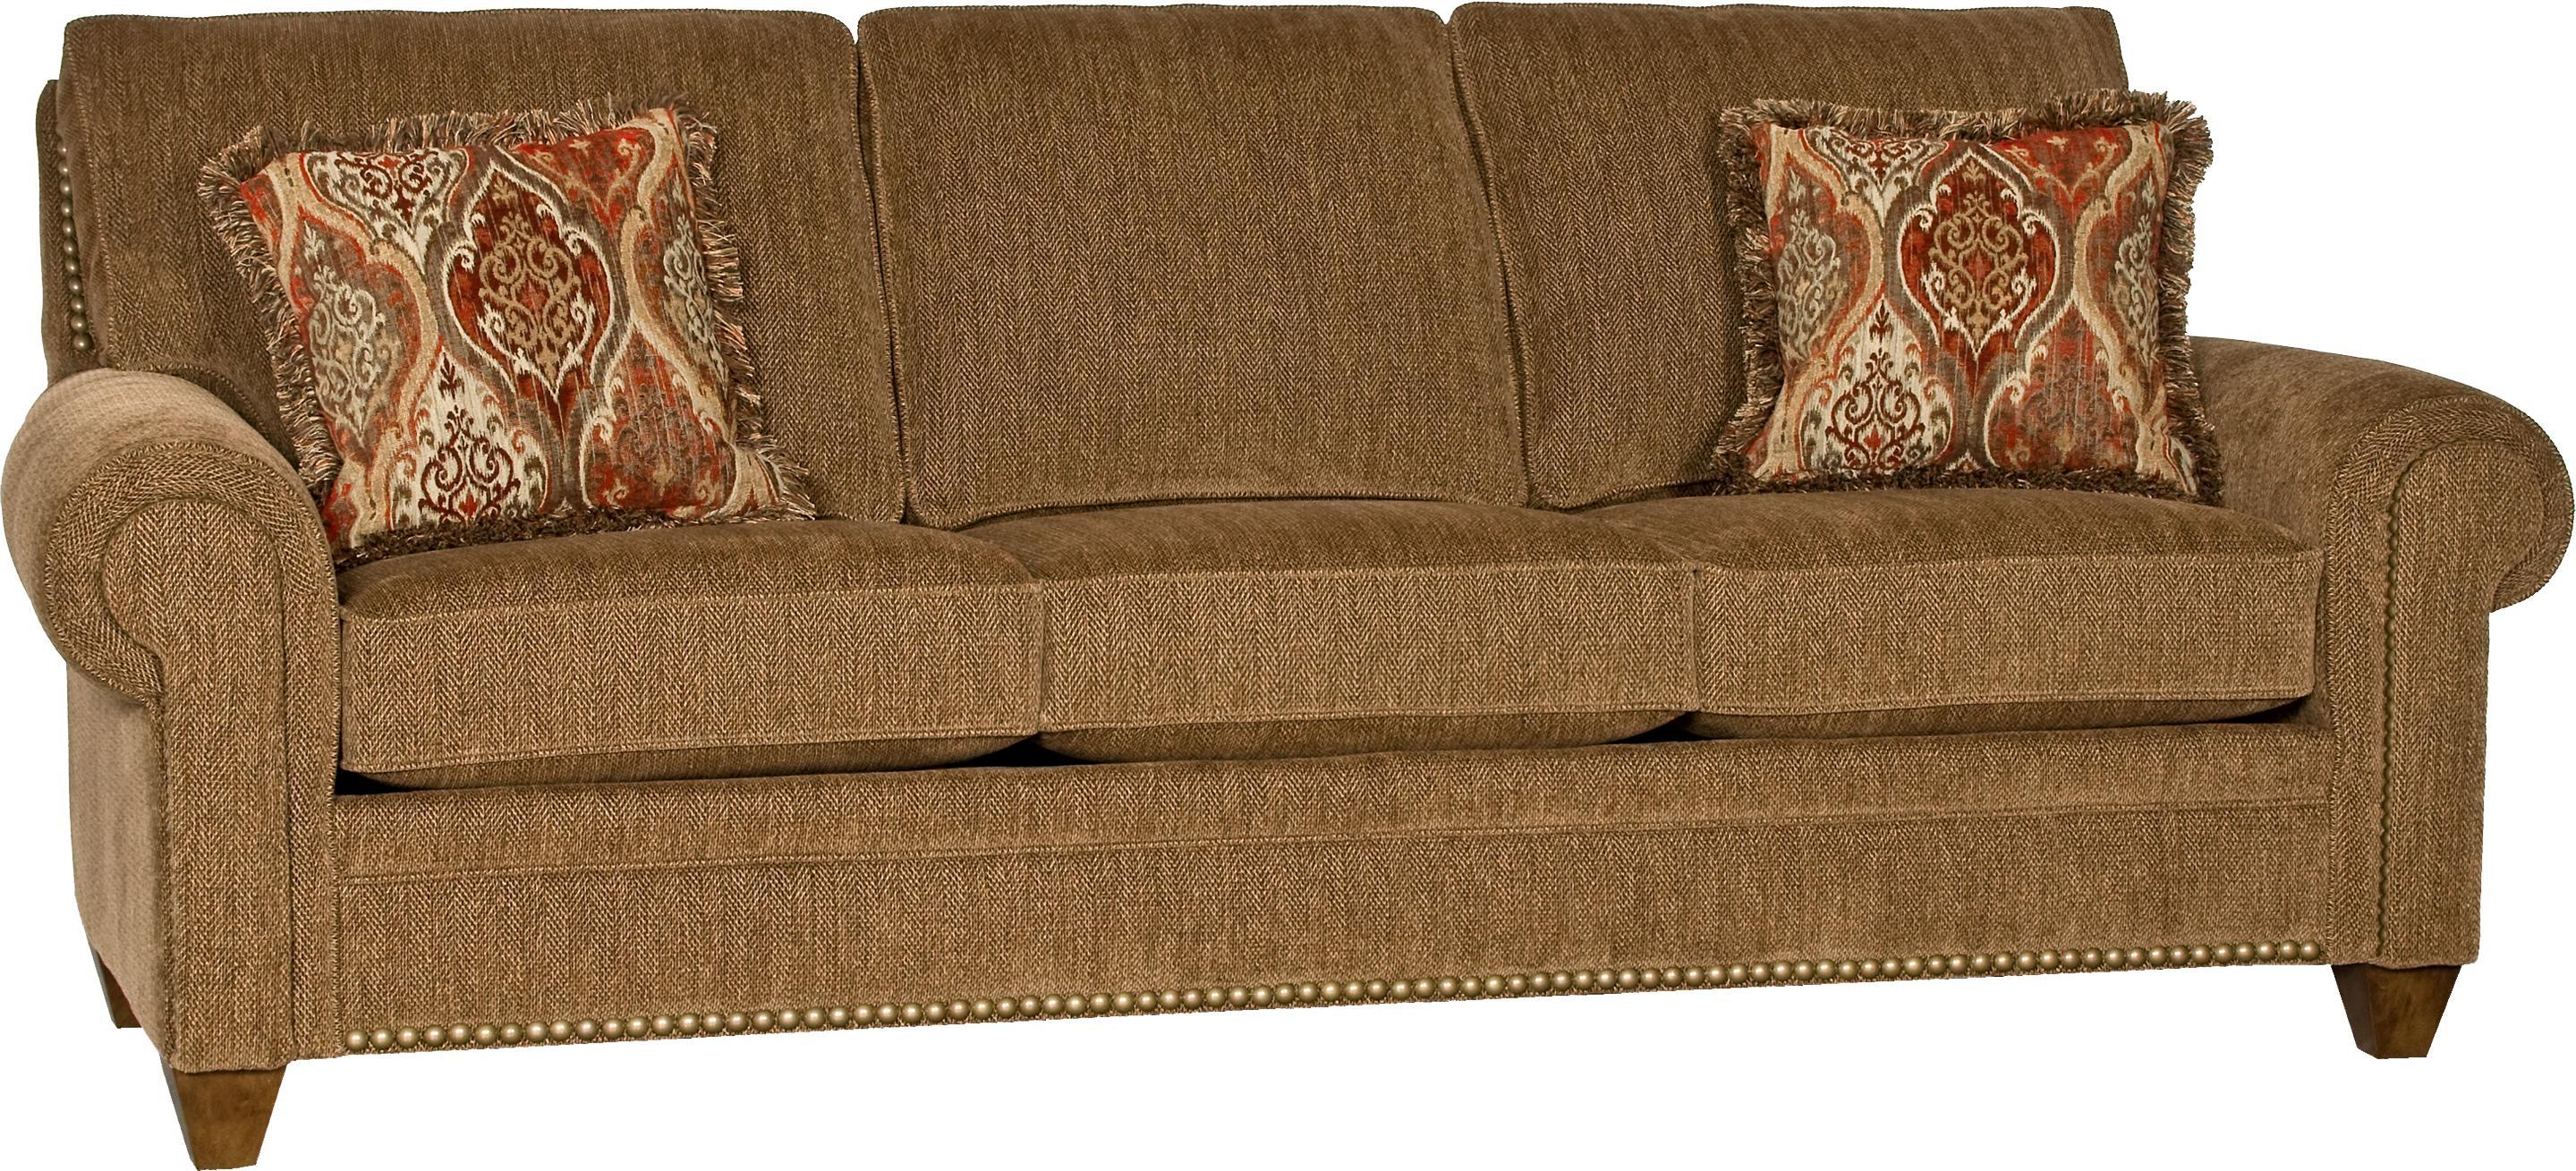 Mayo 2840 Sofa - Item Number: 2840-010